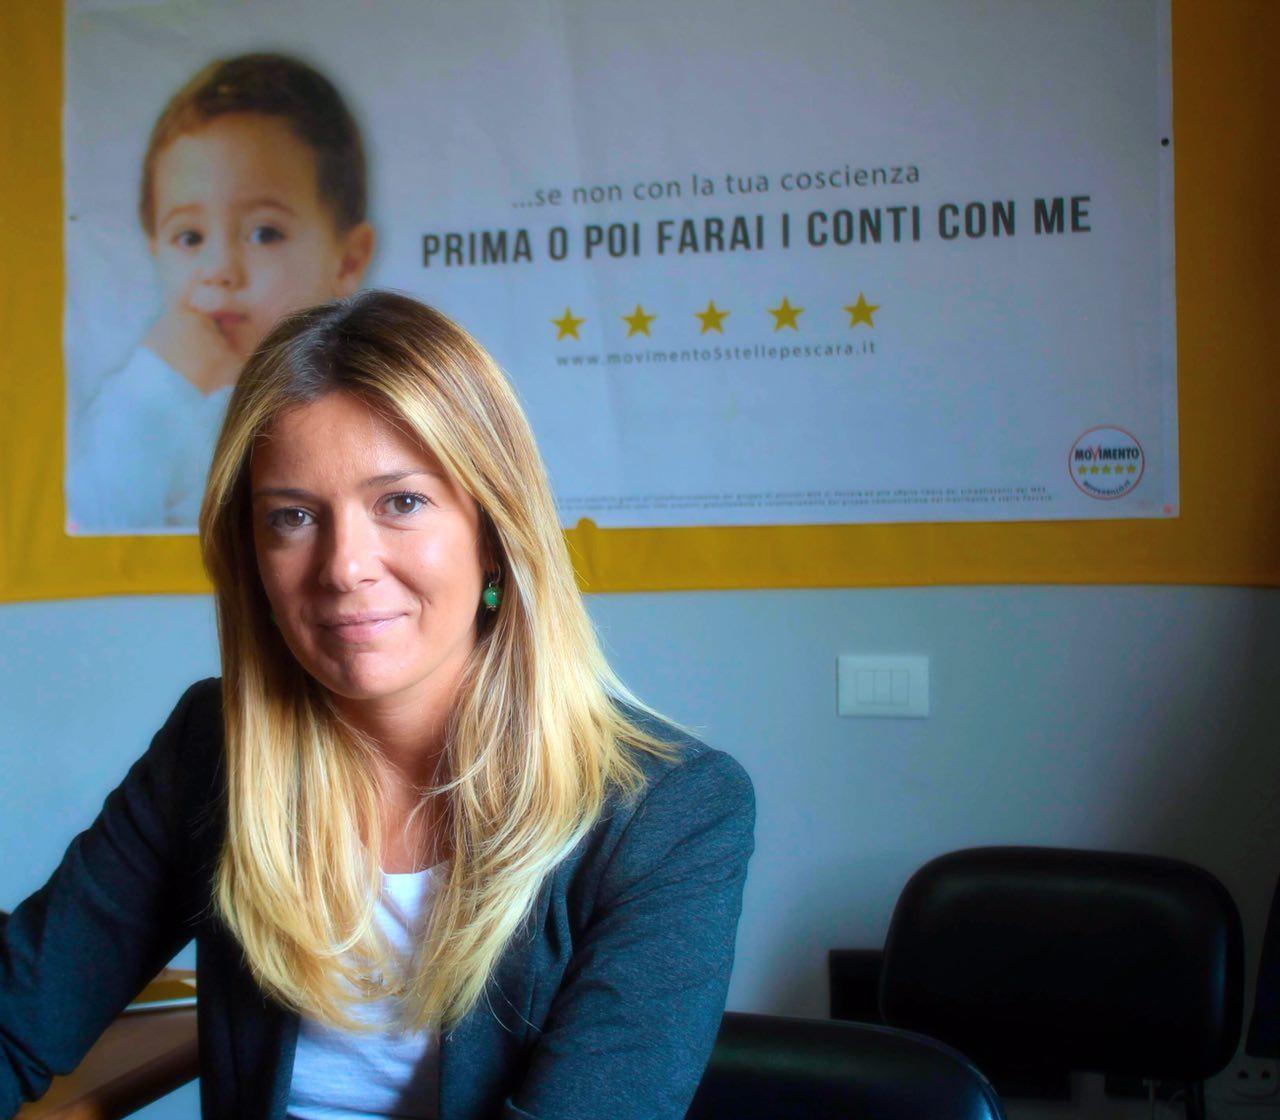 Piani emergenza: Marcozzi (M5S) scrive a 300 sindaci